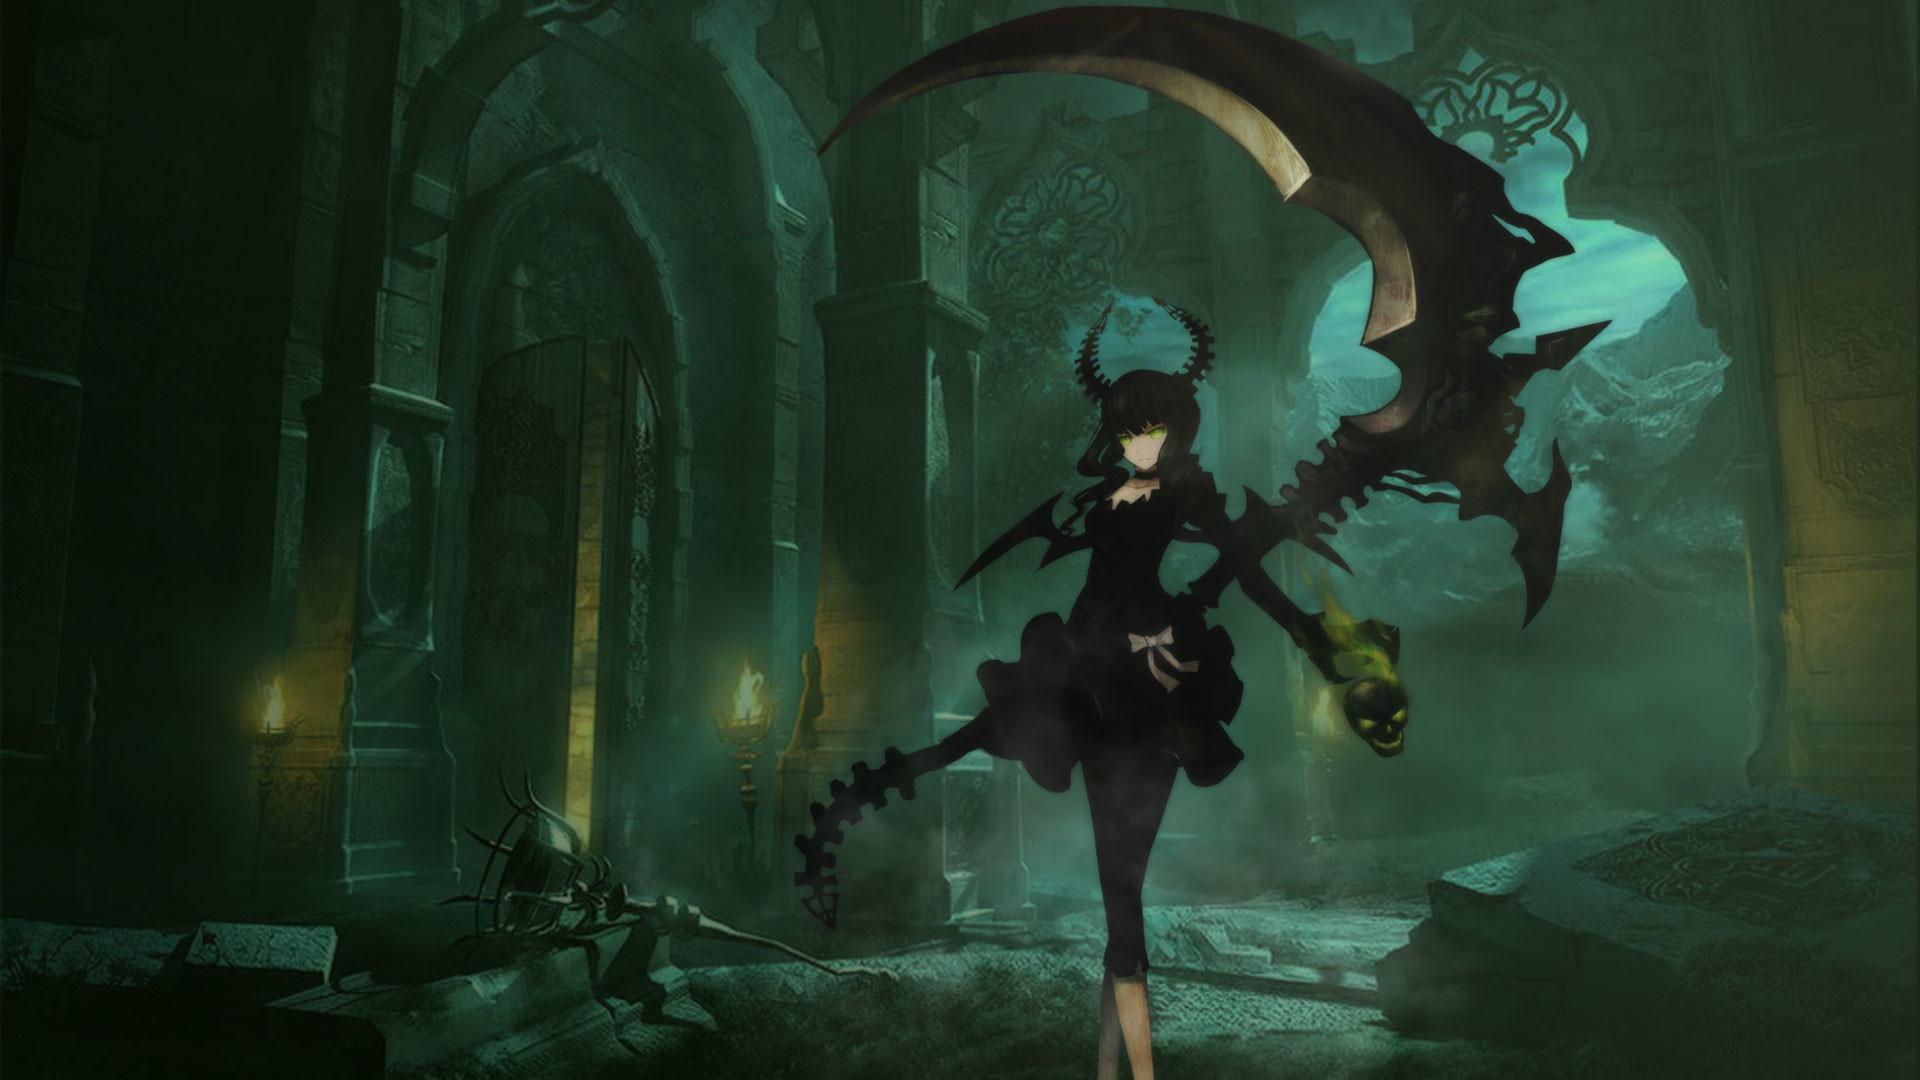 166 HD Anime Wallpapers